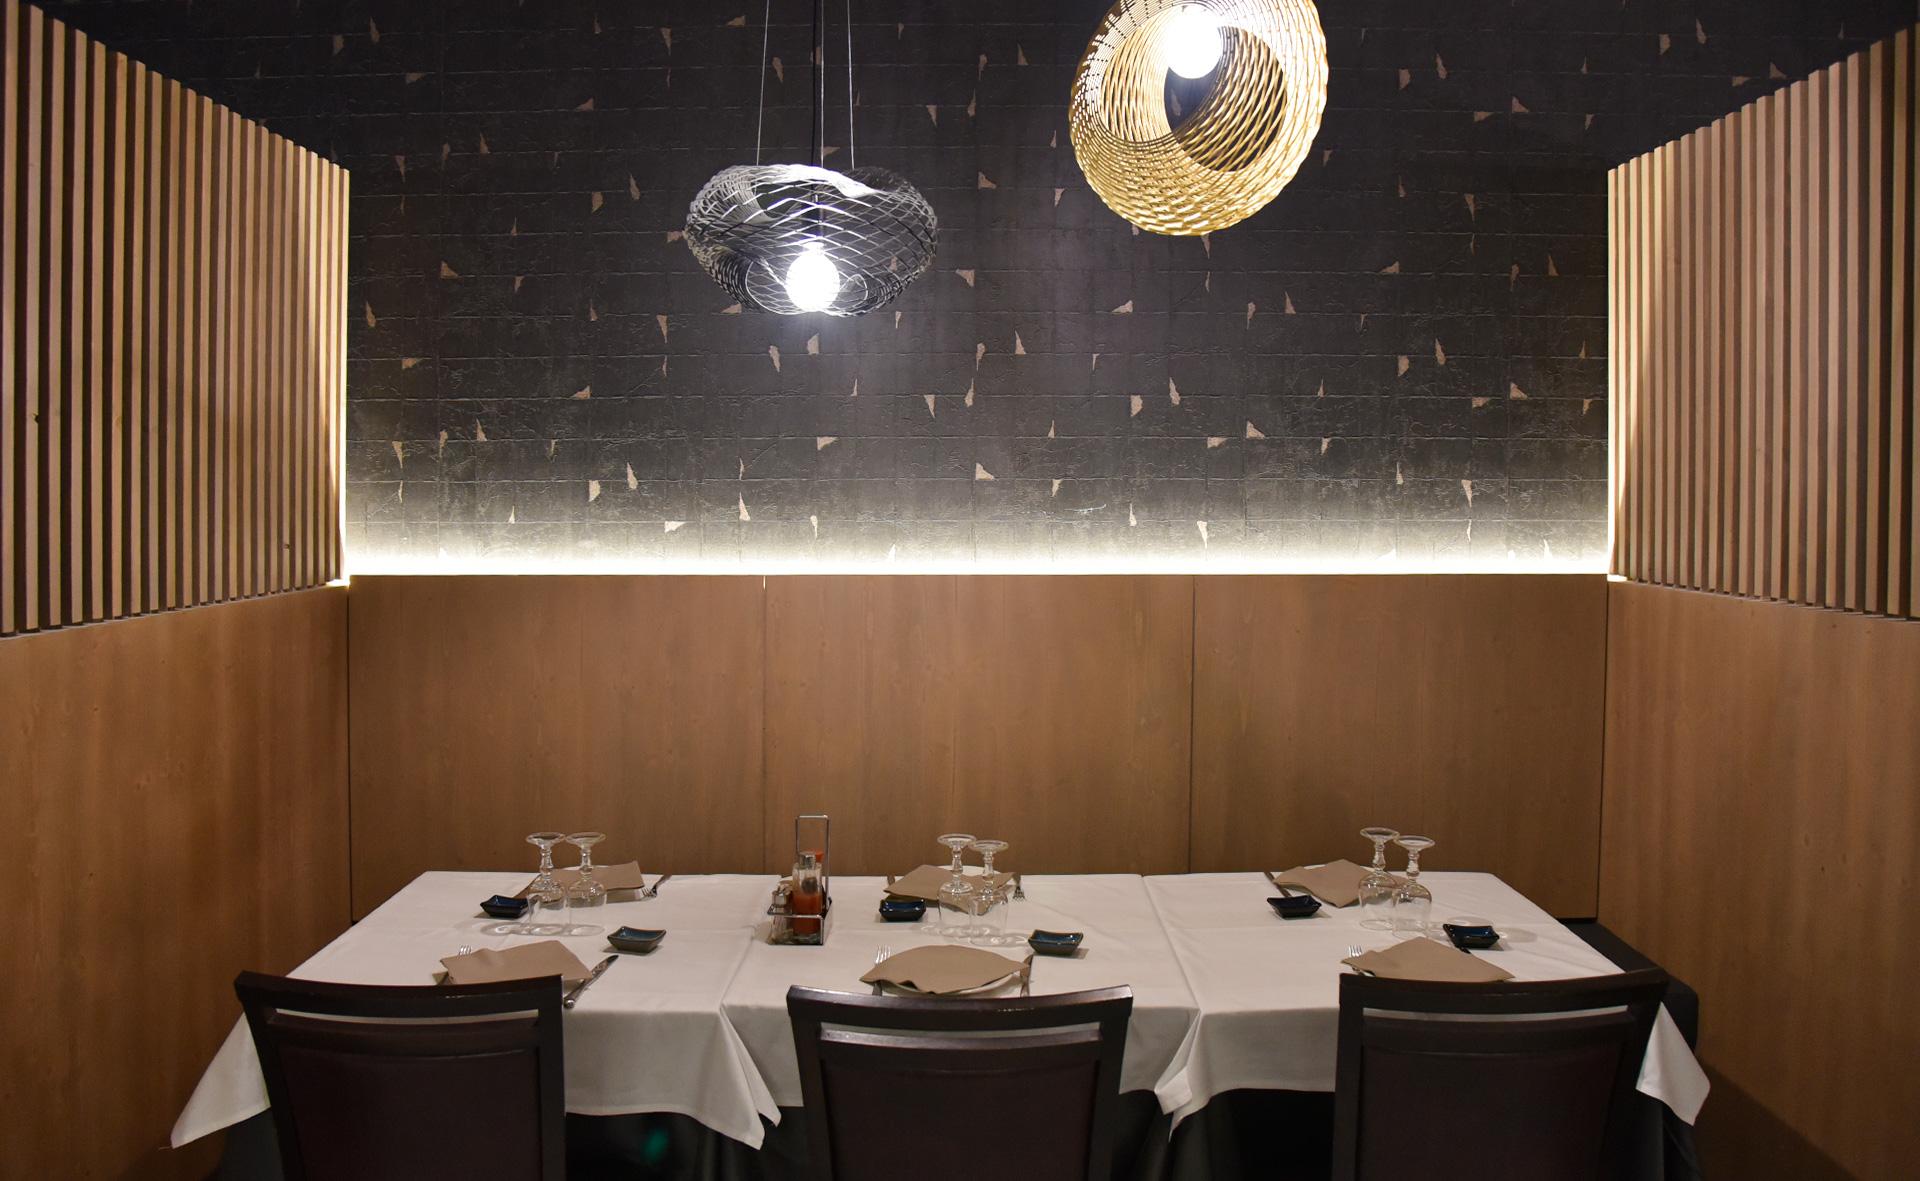 ristorante nuova hong kong reggio emilia